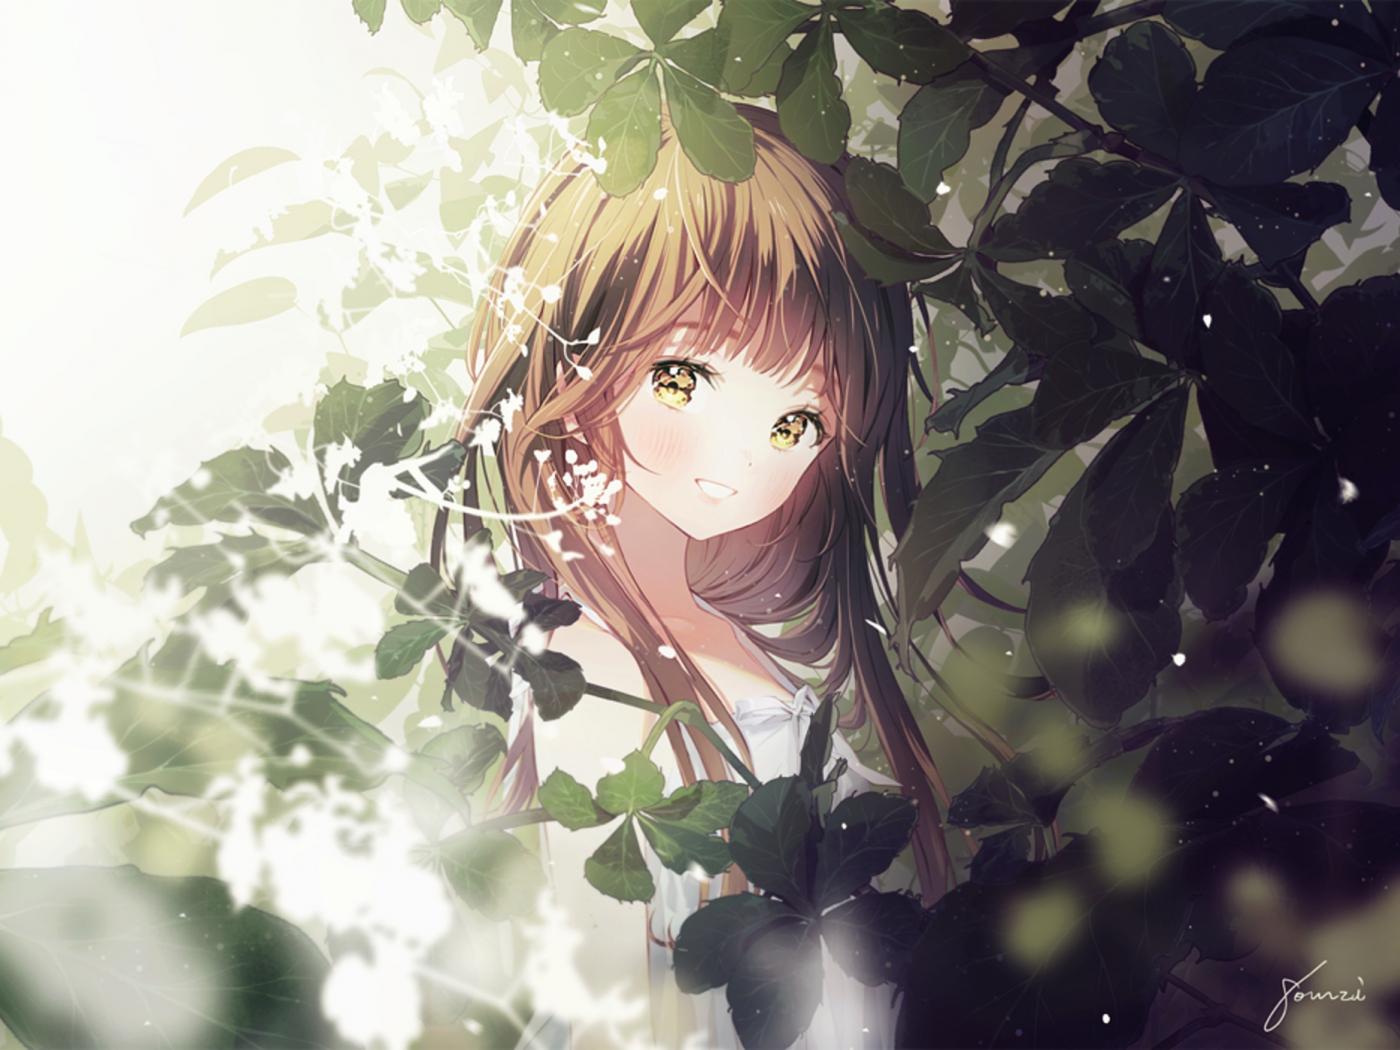 Desktop Wallpaper Smile Cute Anime Girl Original Brown Hair Hd Image Picture Background 0829f1